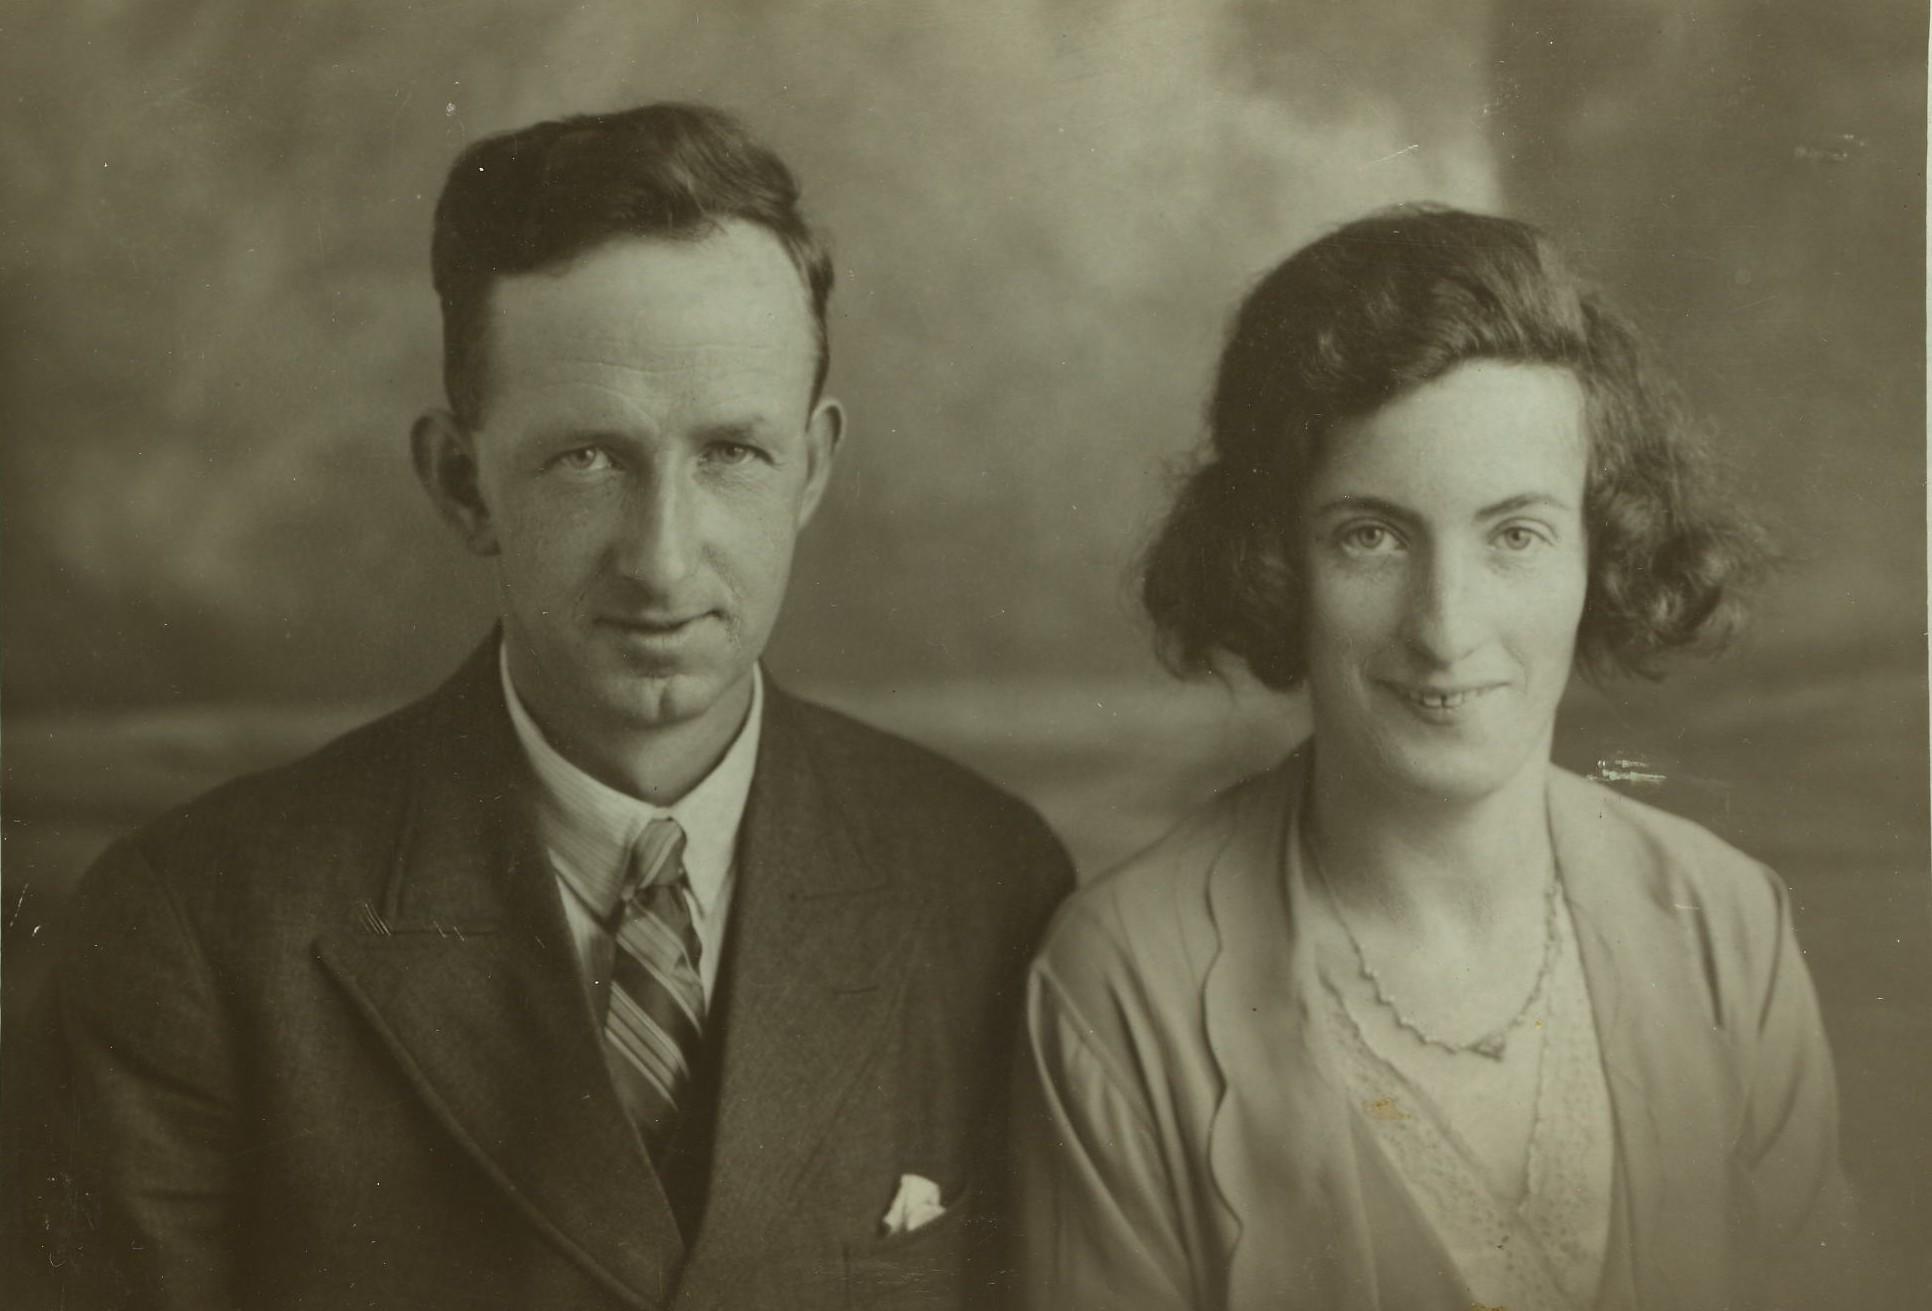 Lachie Sinclair & Alice McNair